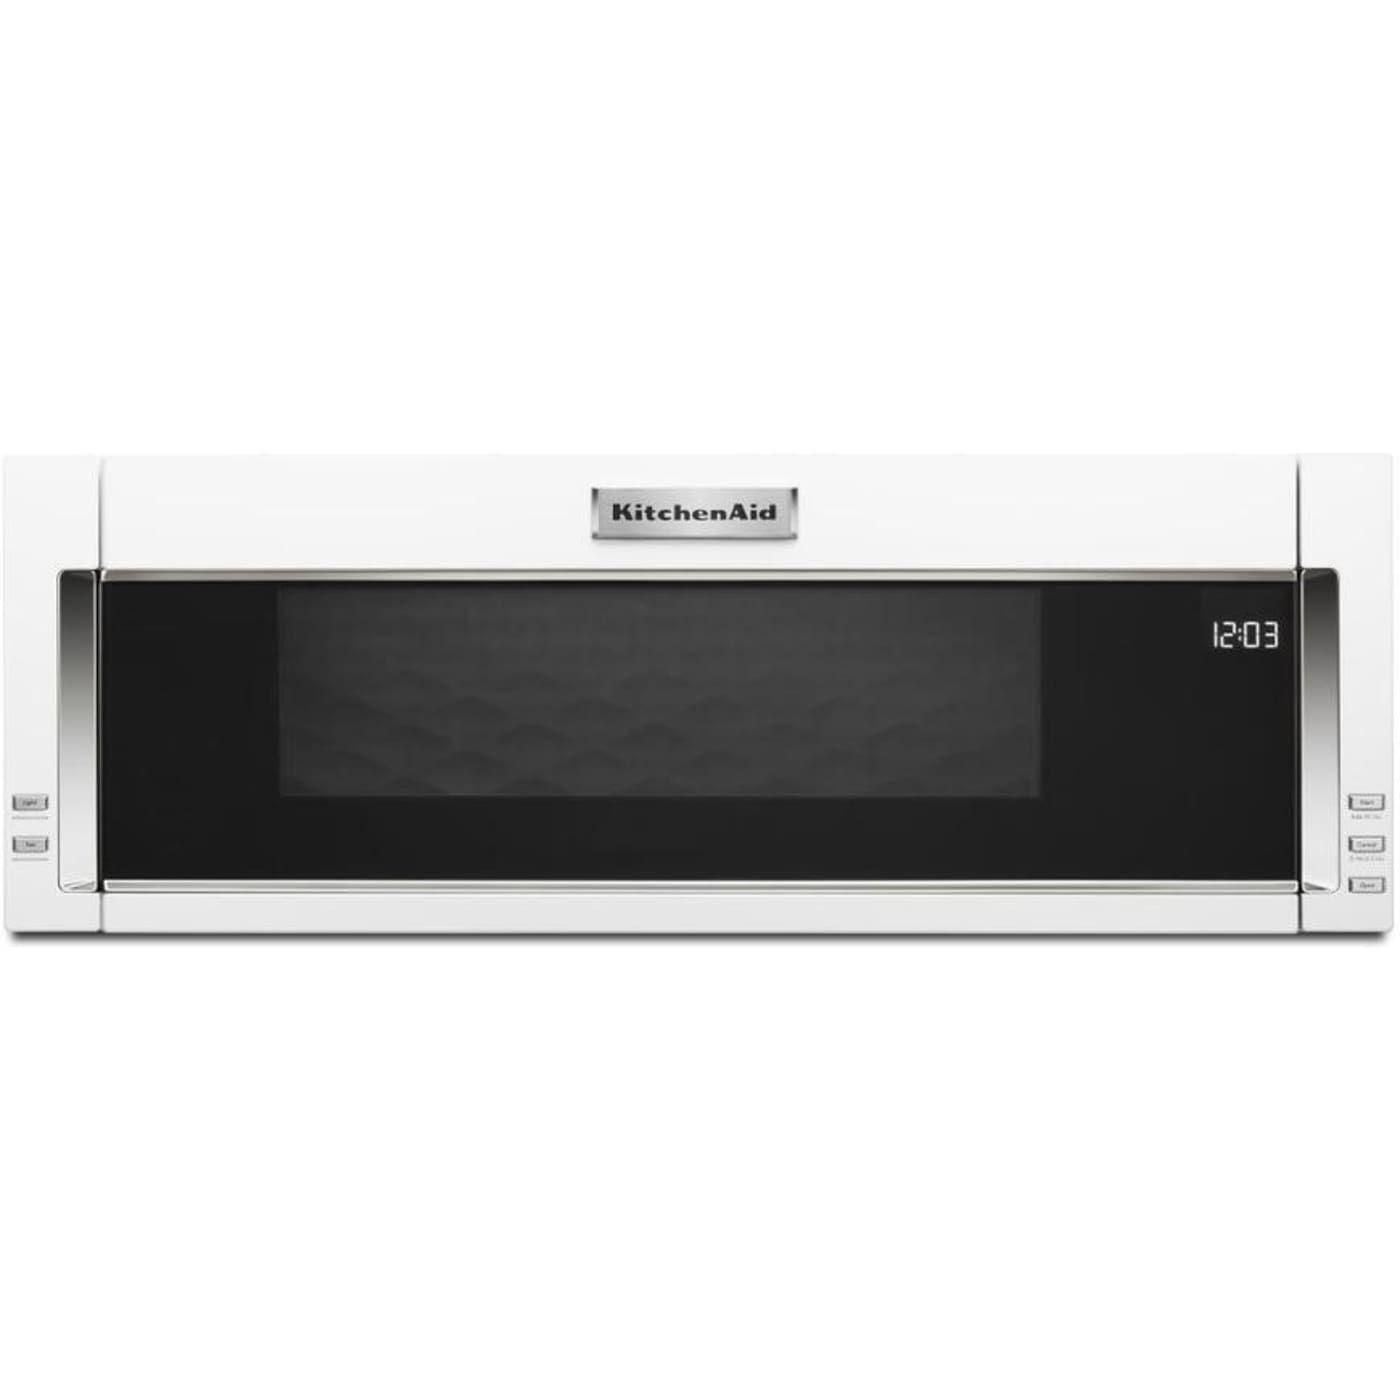 Kmls311hwh by kitchenaid overtherange microwaves